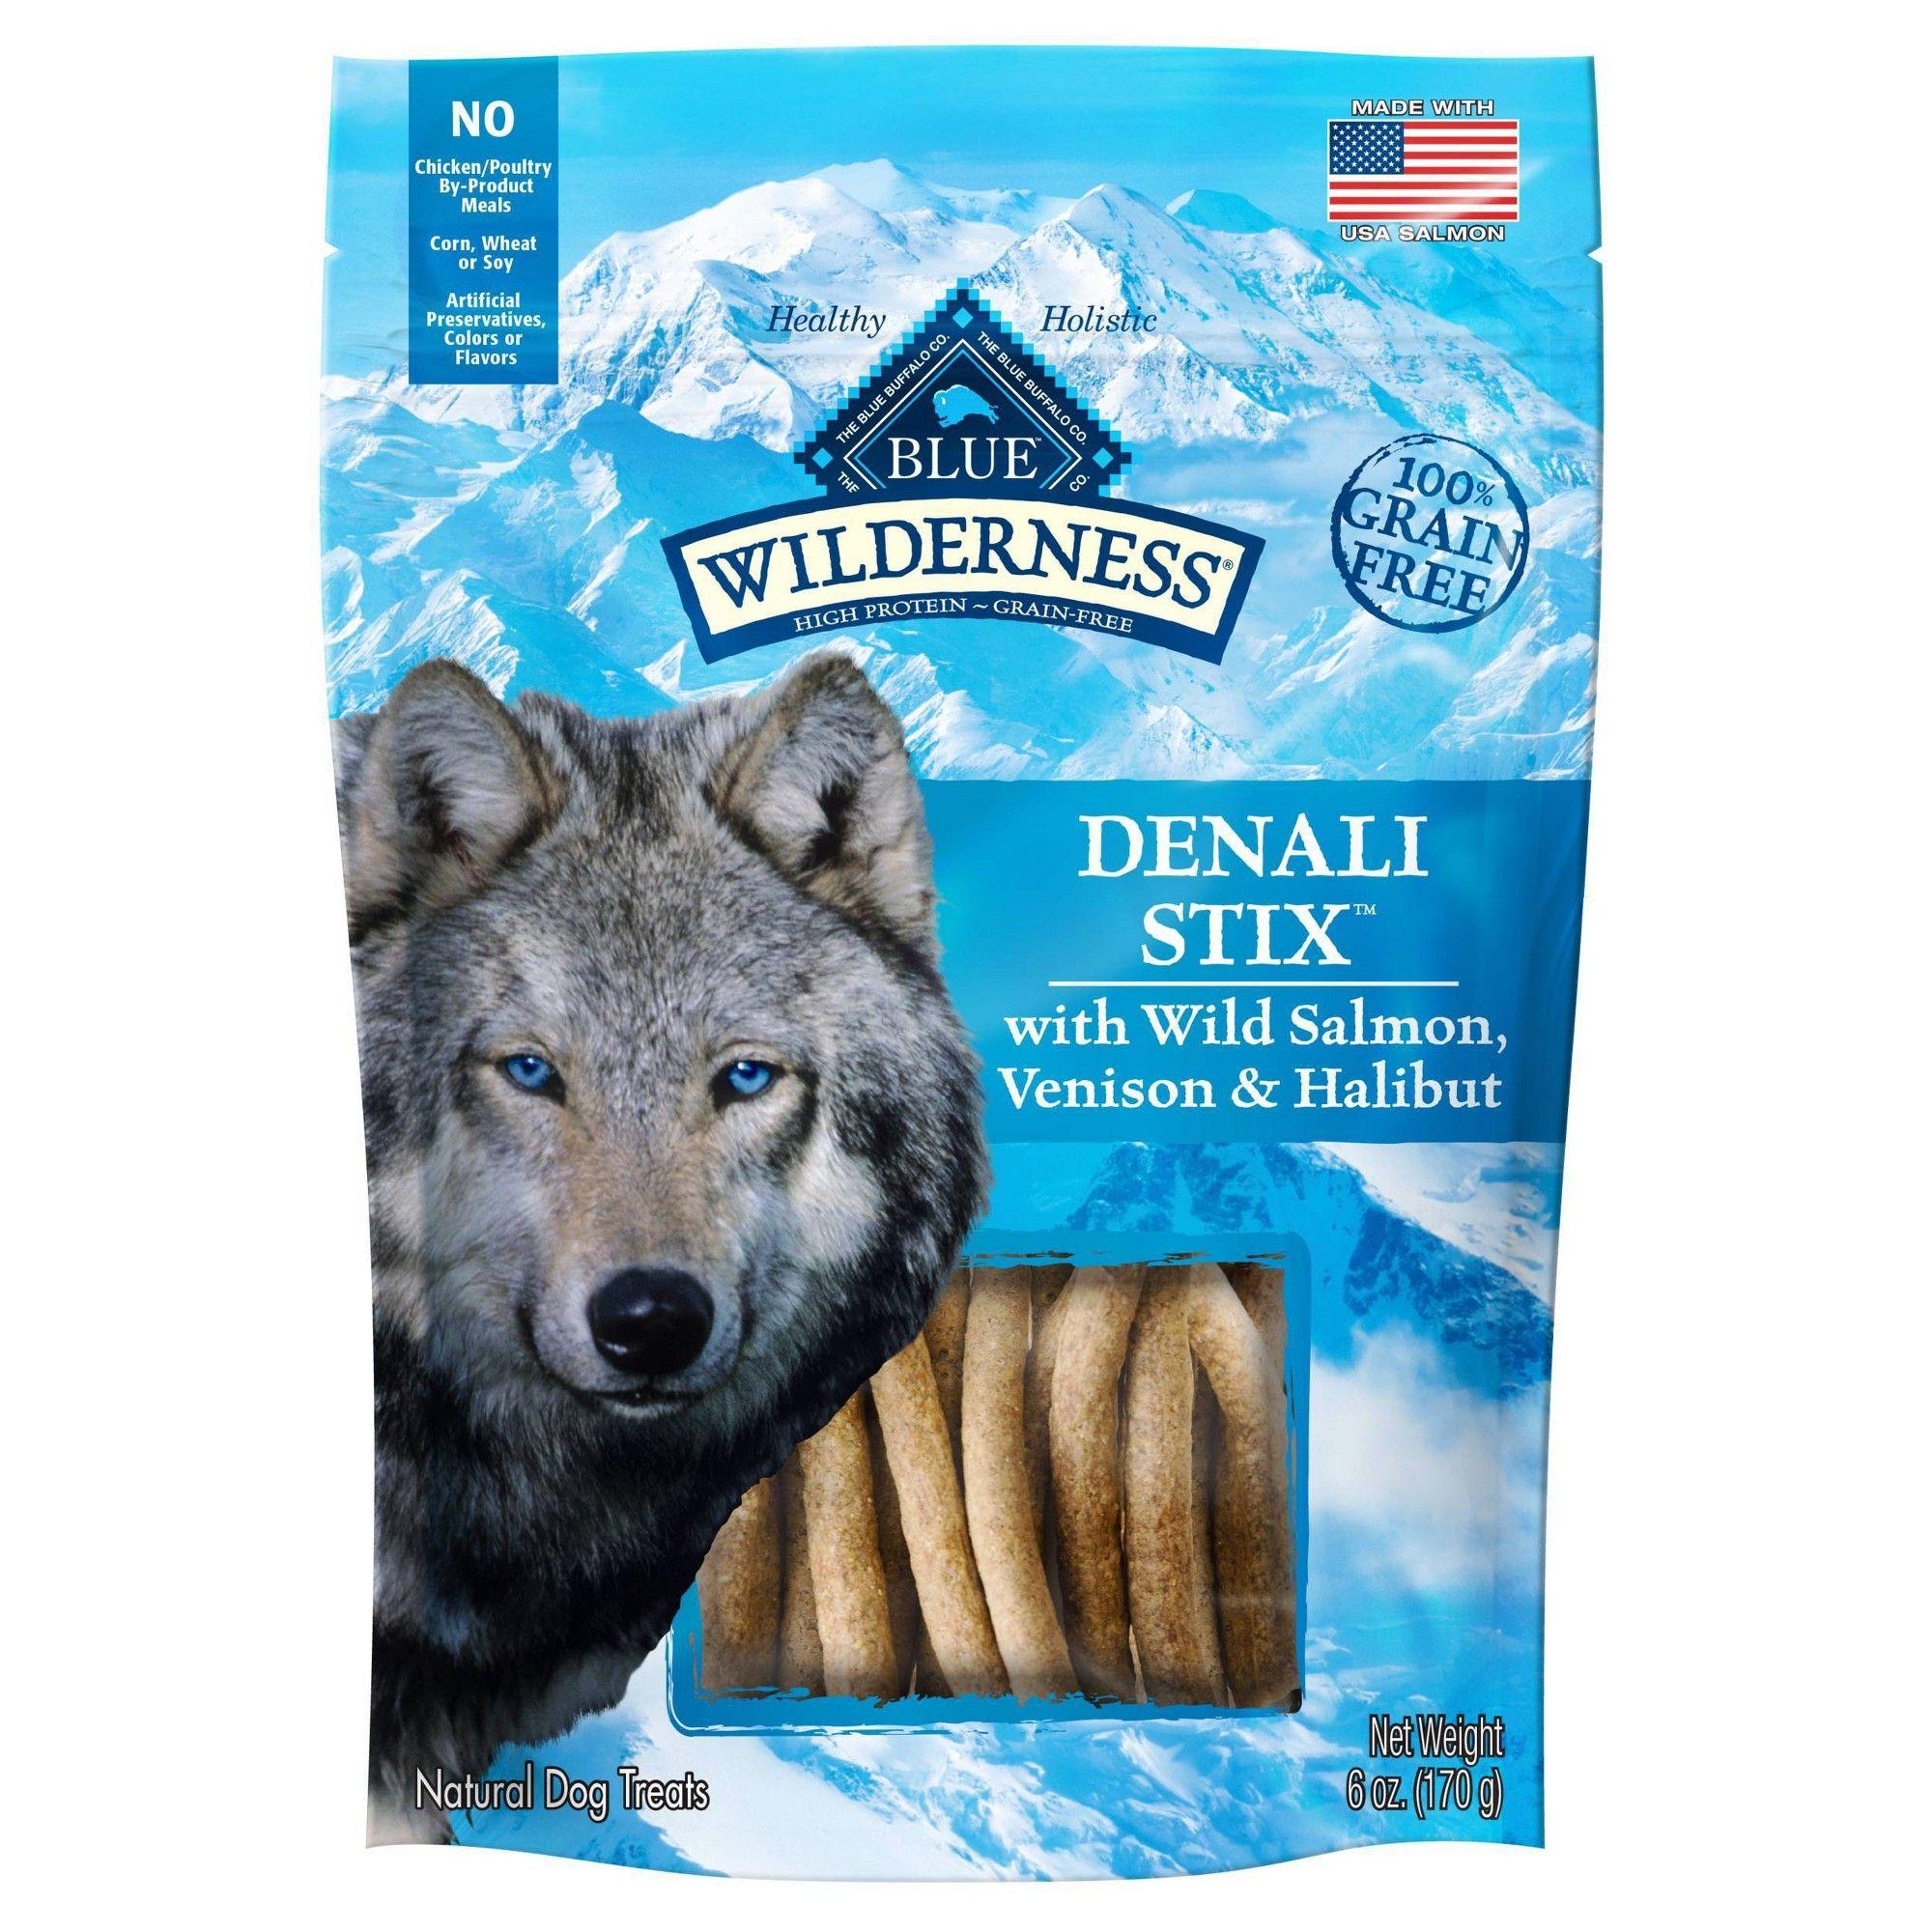 Blue Buffalo Wilderness Denali Dinner Stix Dog Treats 6oz